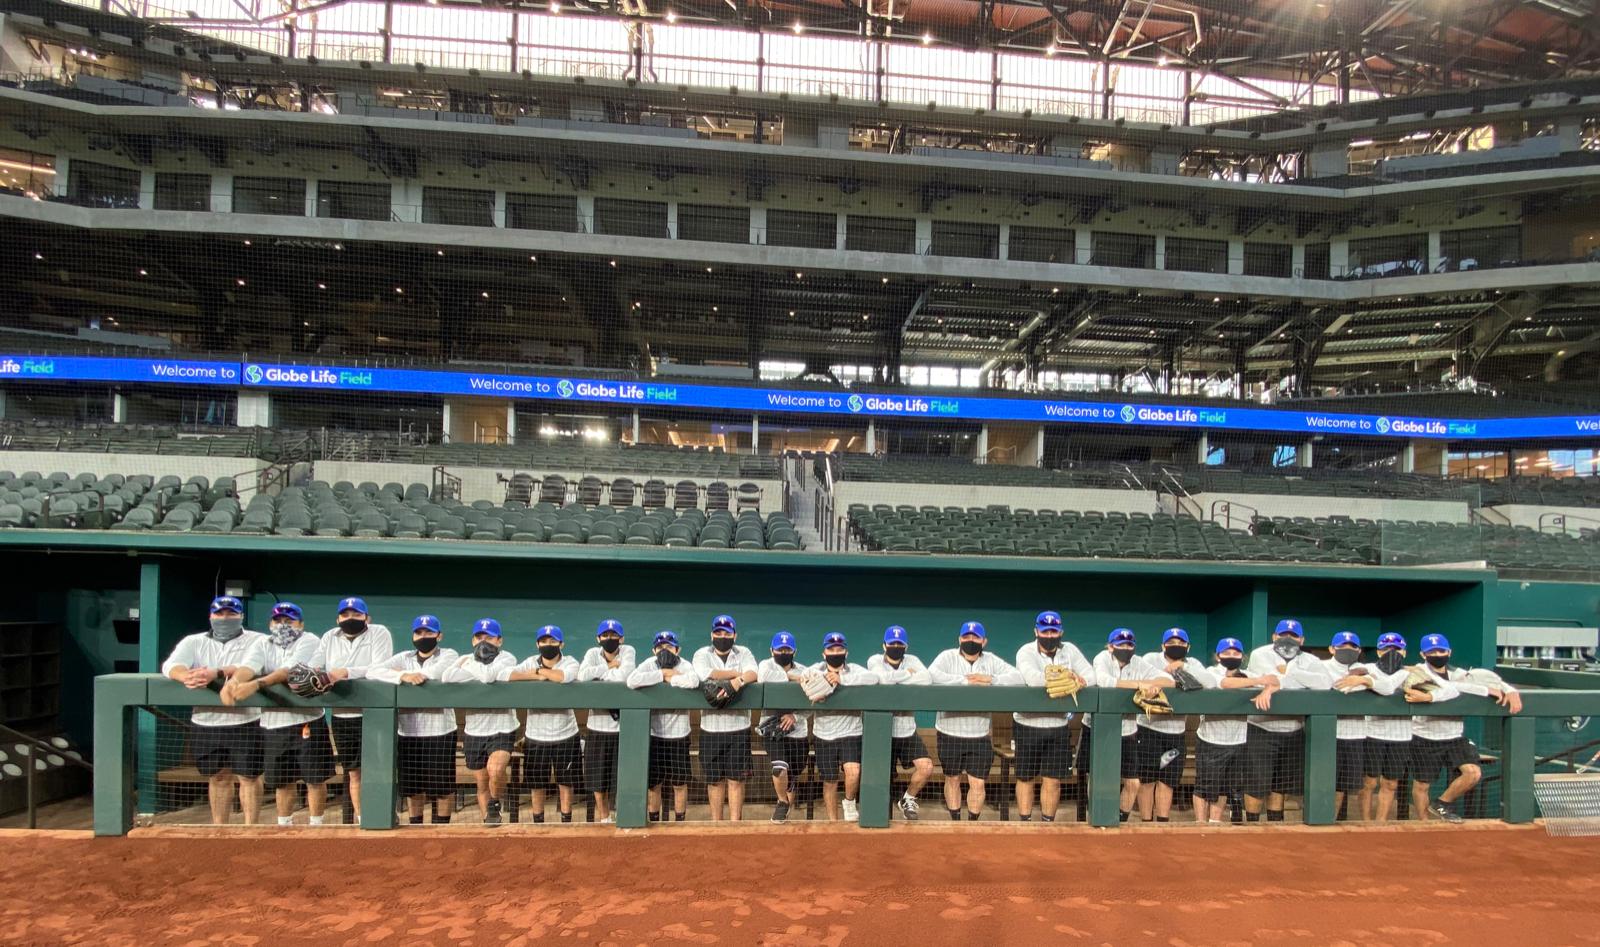 Photo gallery: North Dallas baseball team at Globe Life Park with Frank Miller — Feb. 4, 2021